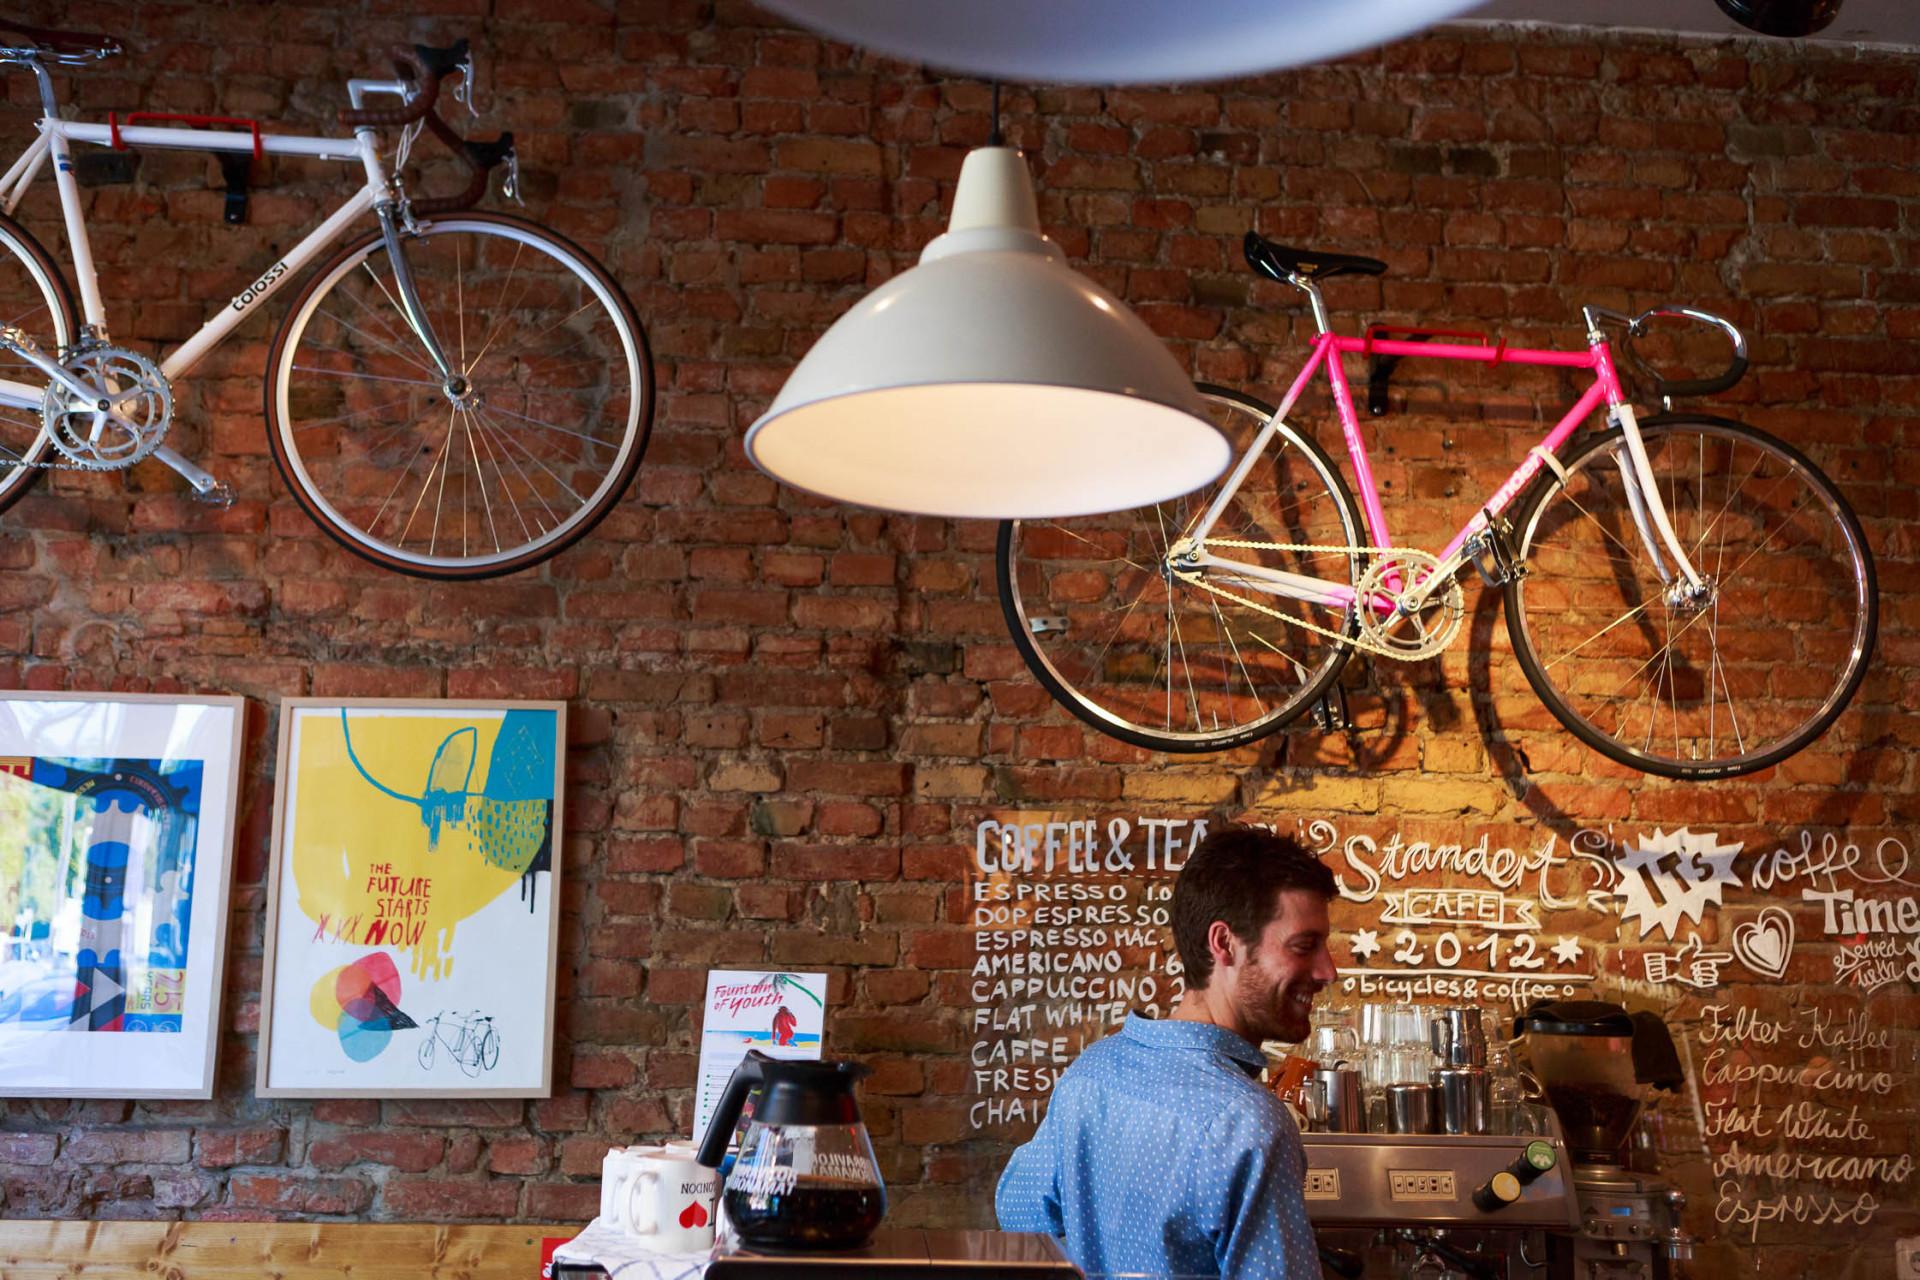 09-Standert-Bike-Store-Berlin